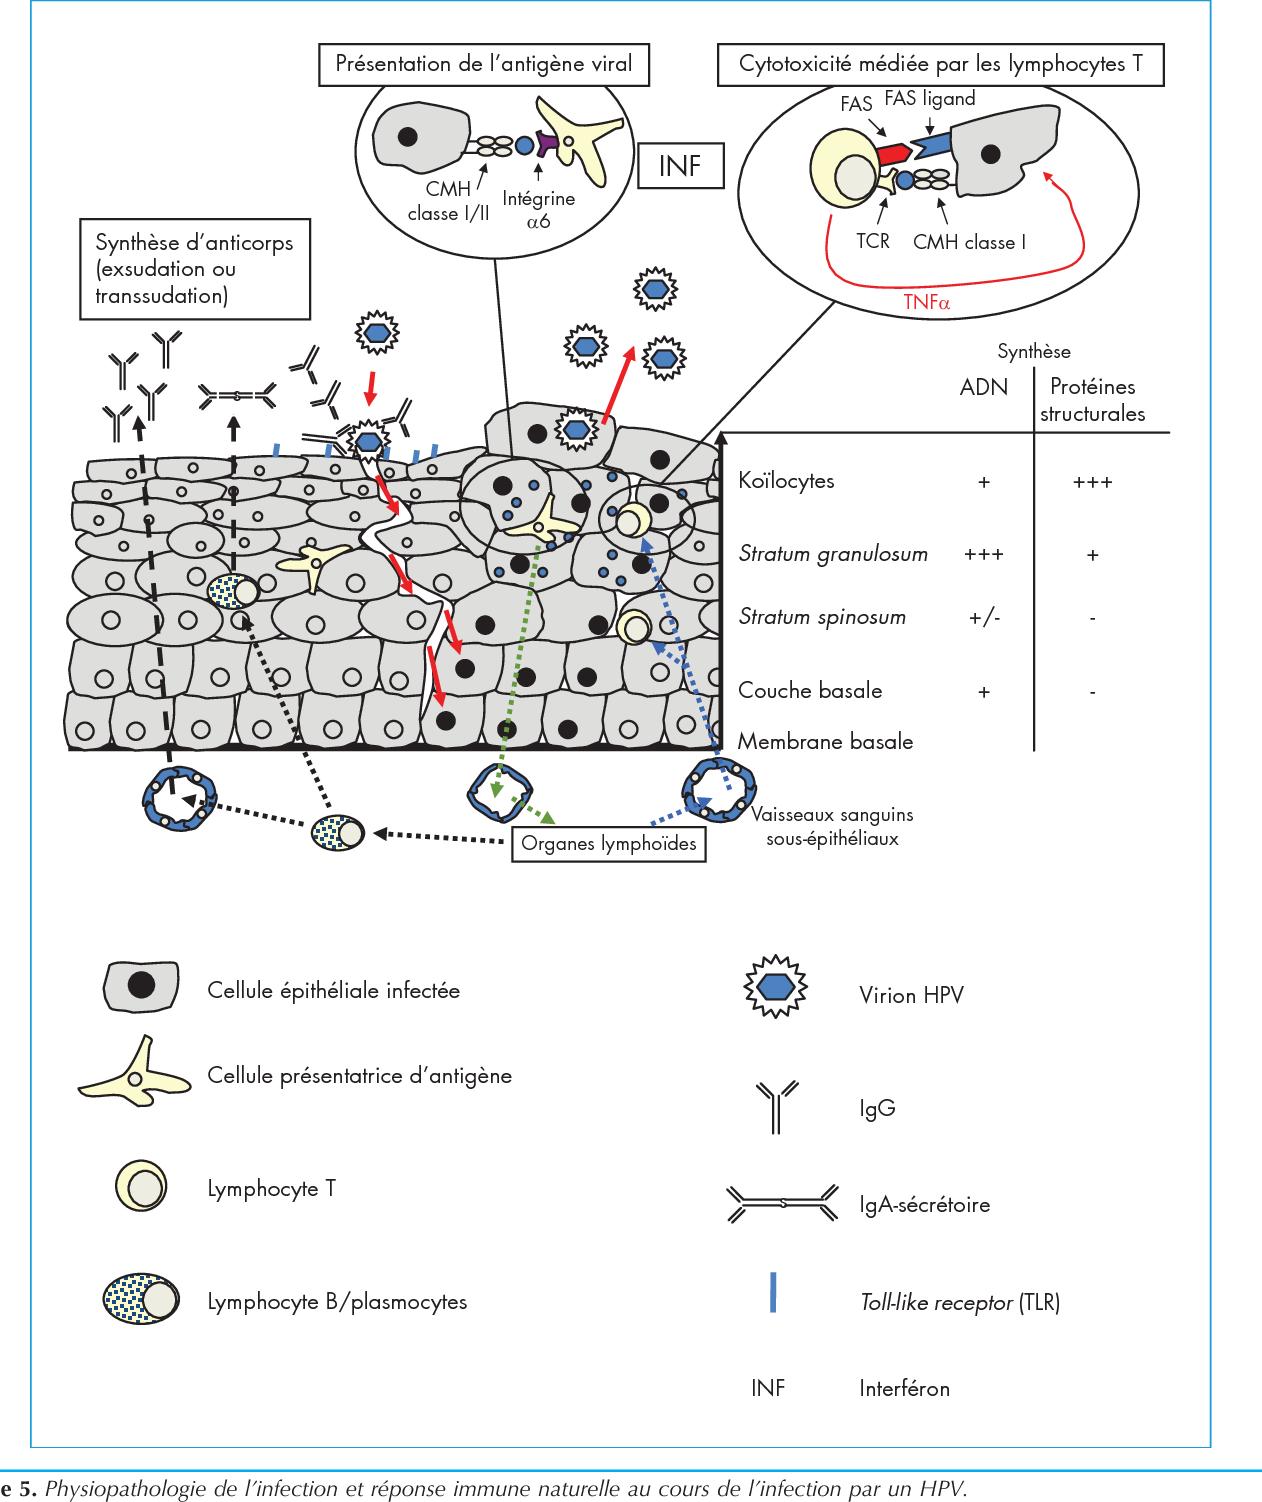 papilloma virus richiami glande virus del papiloma humano